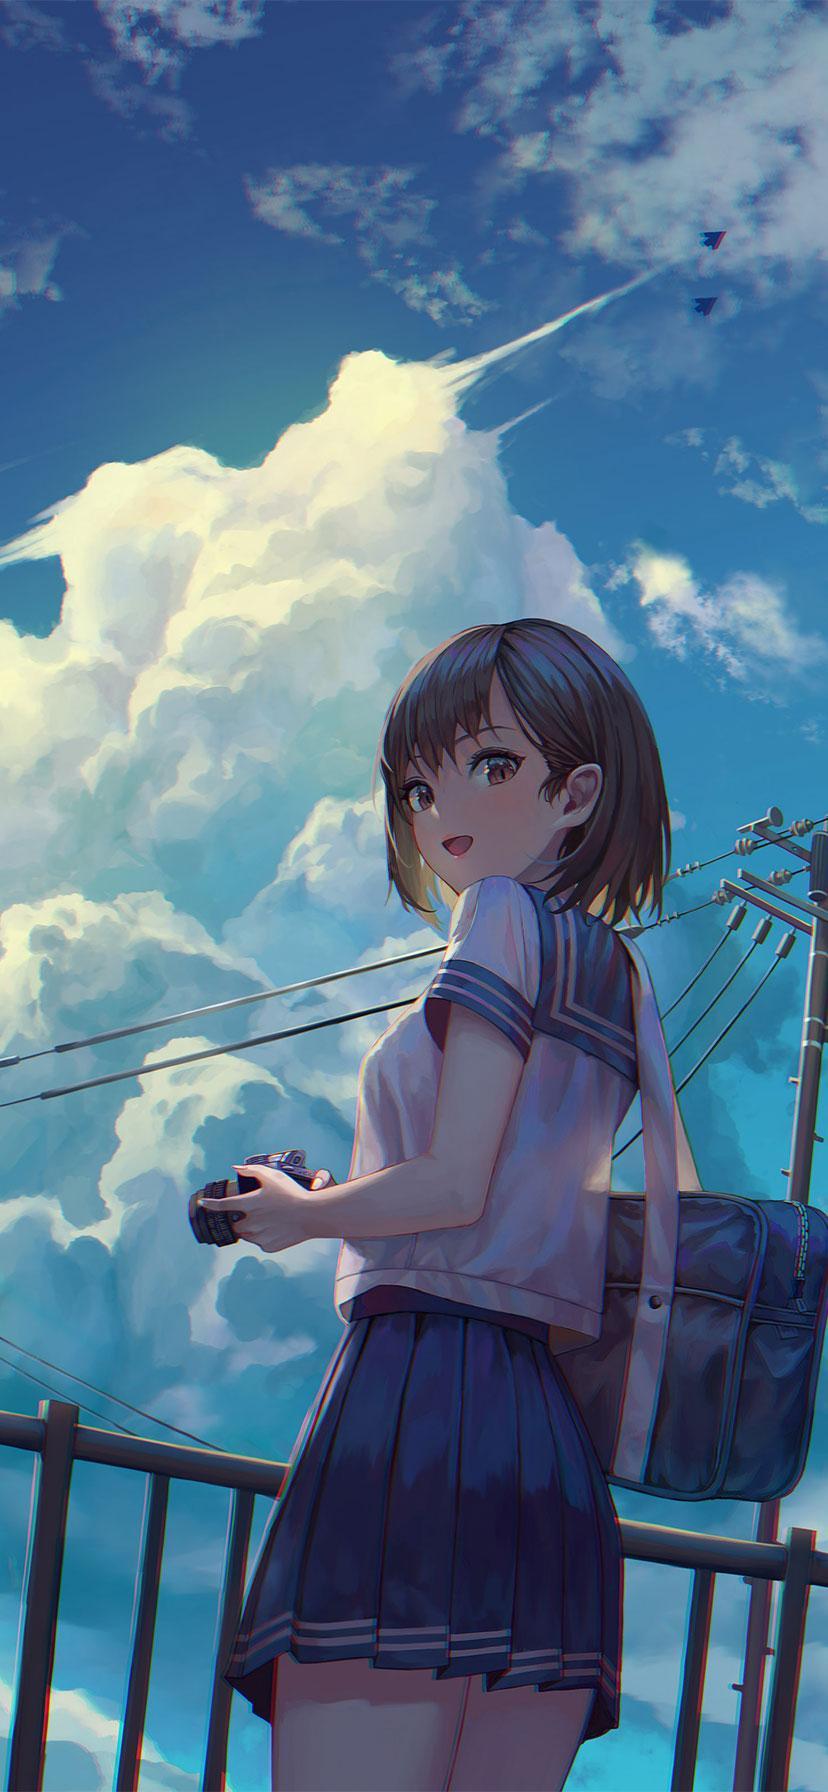 Anime Girl 2019 Wallpapers Wallpaper Cave